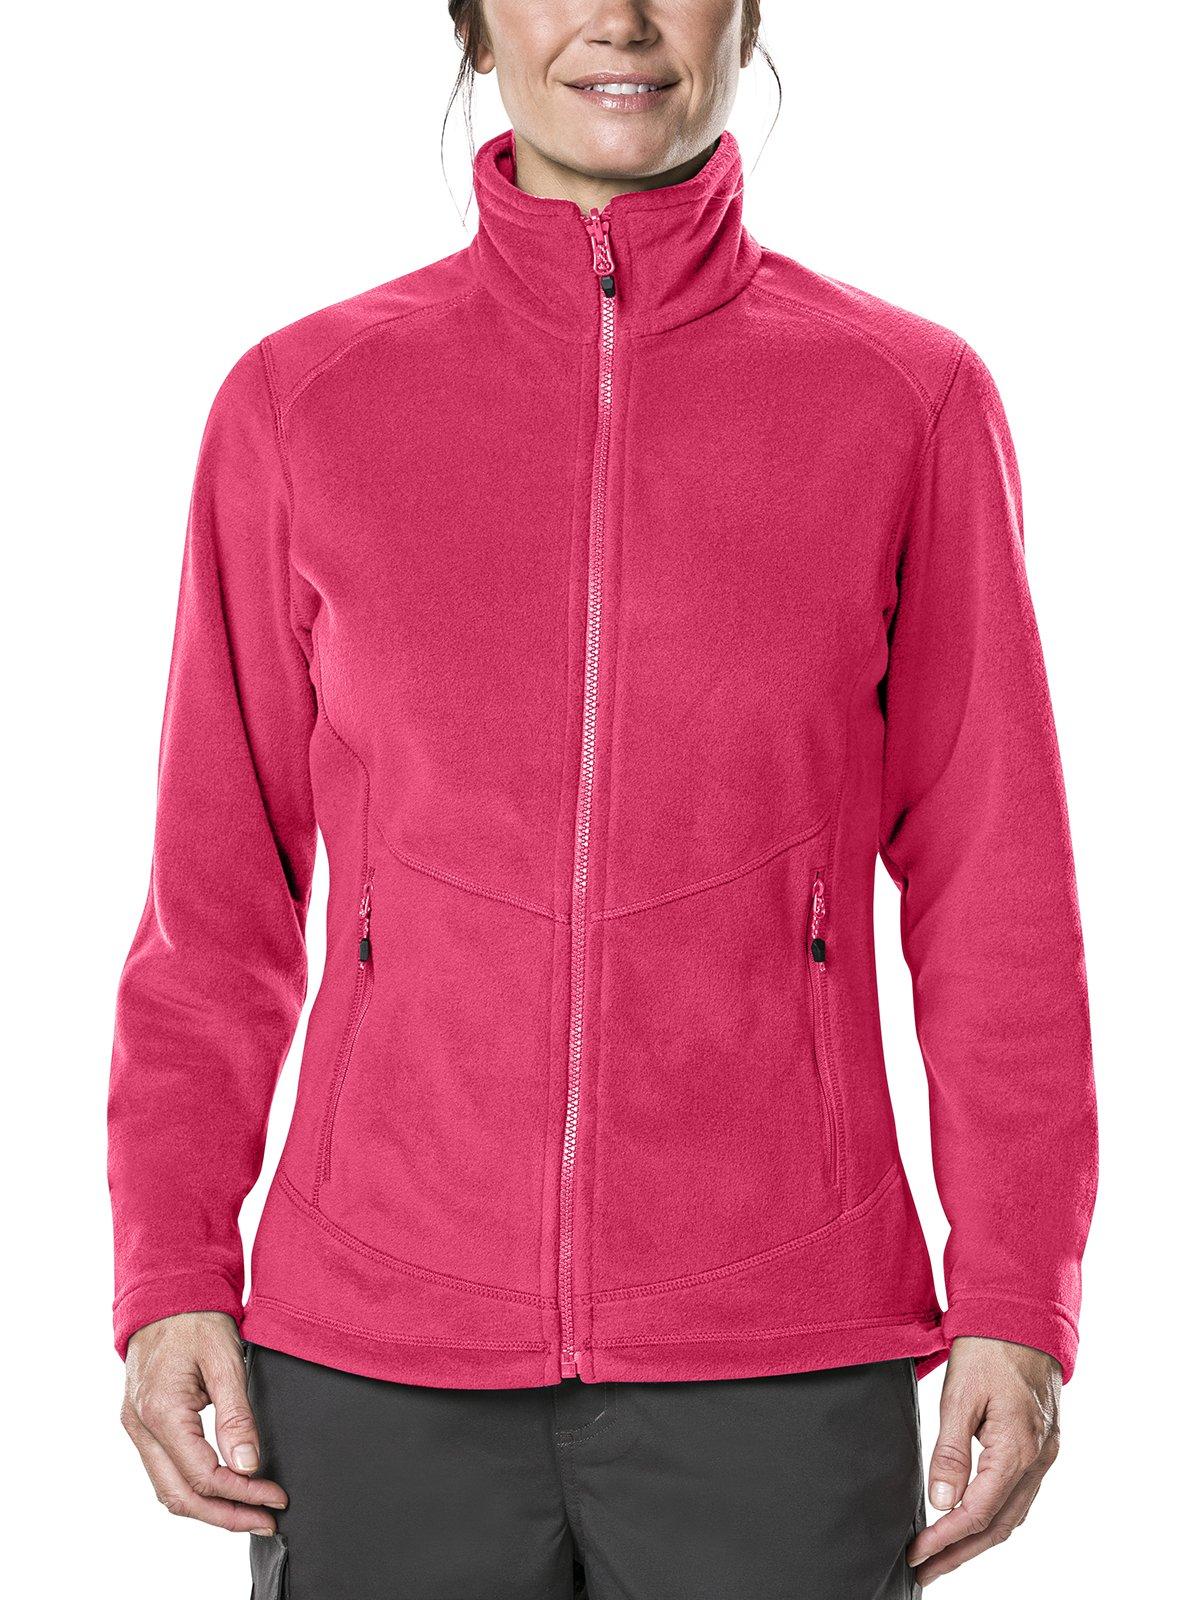 81MDlTgVmnL - Berghaus Prism 2.0 Women's Fleece Jacket